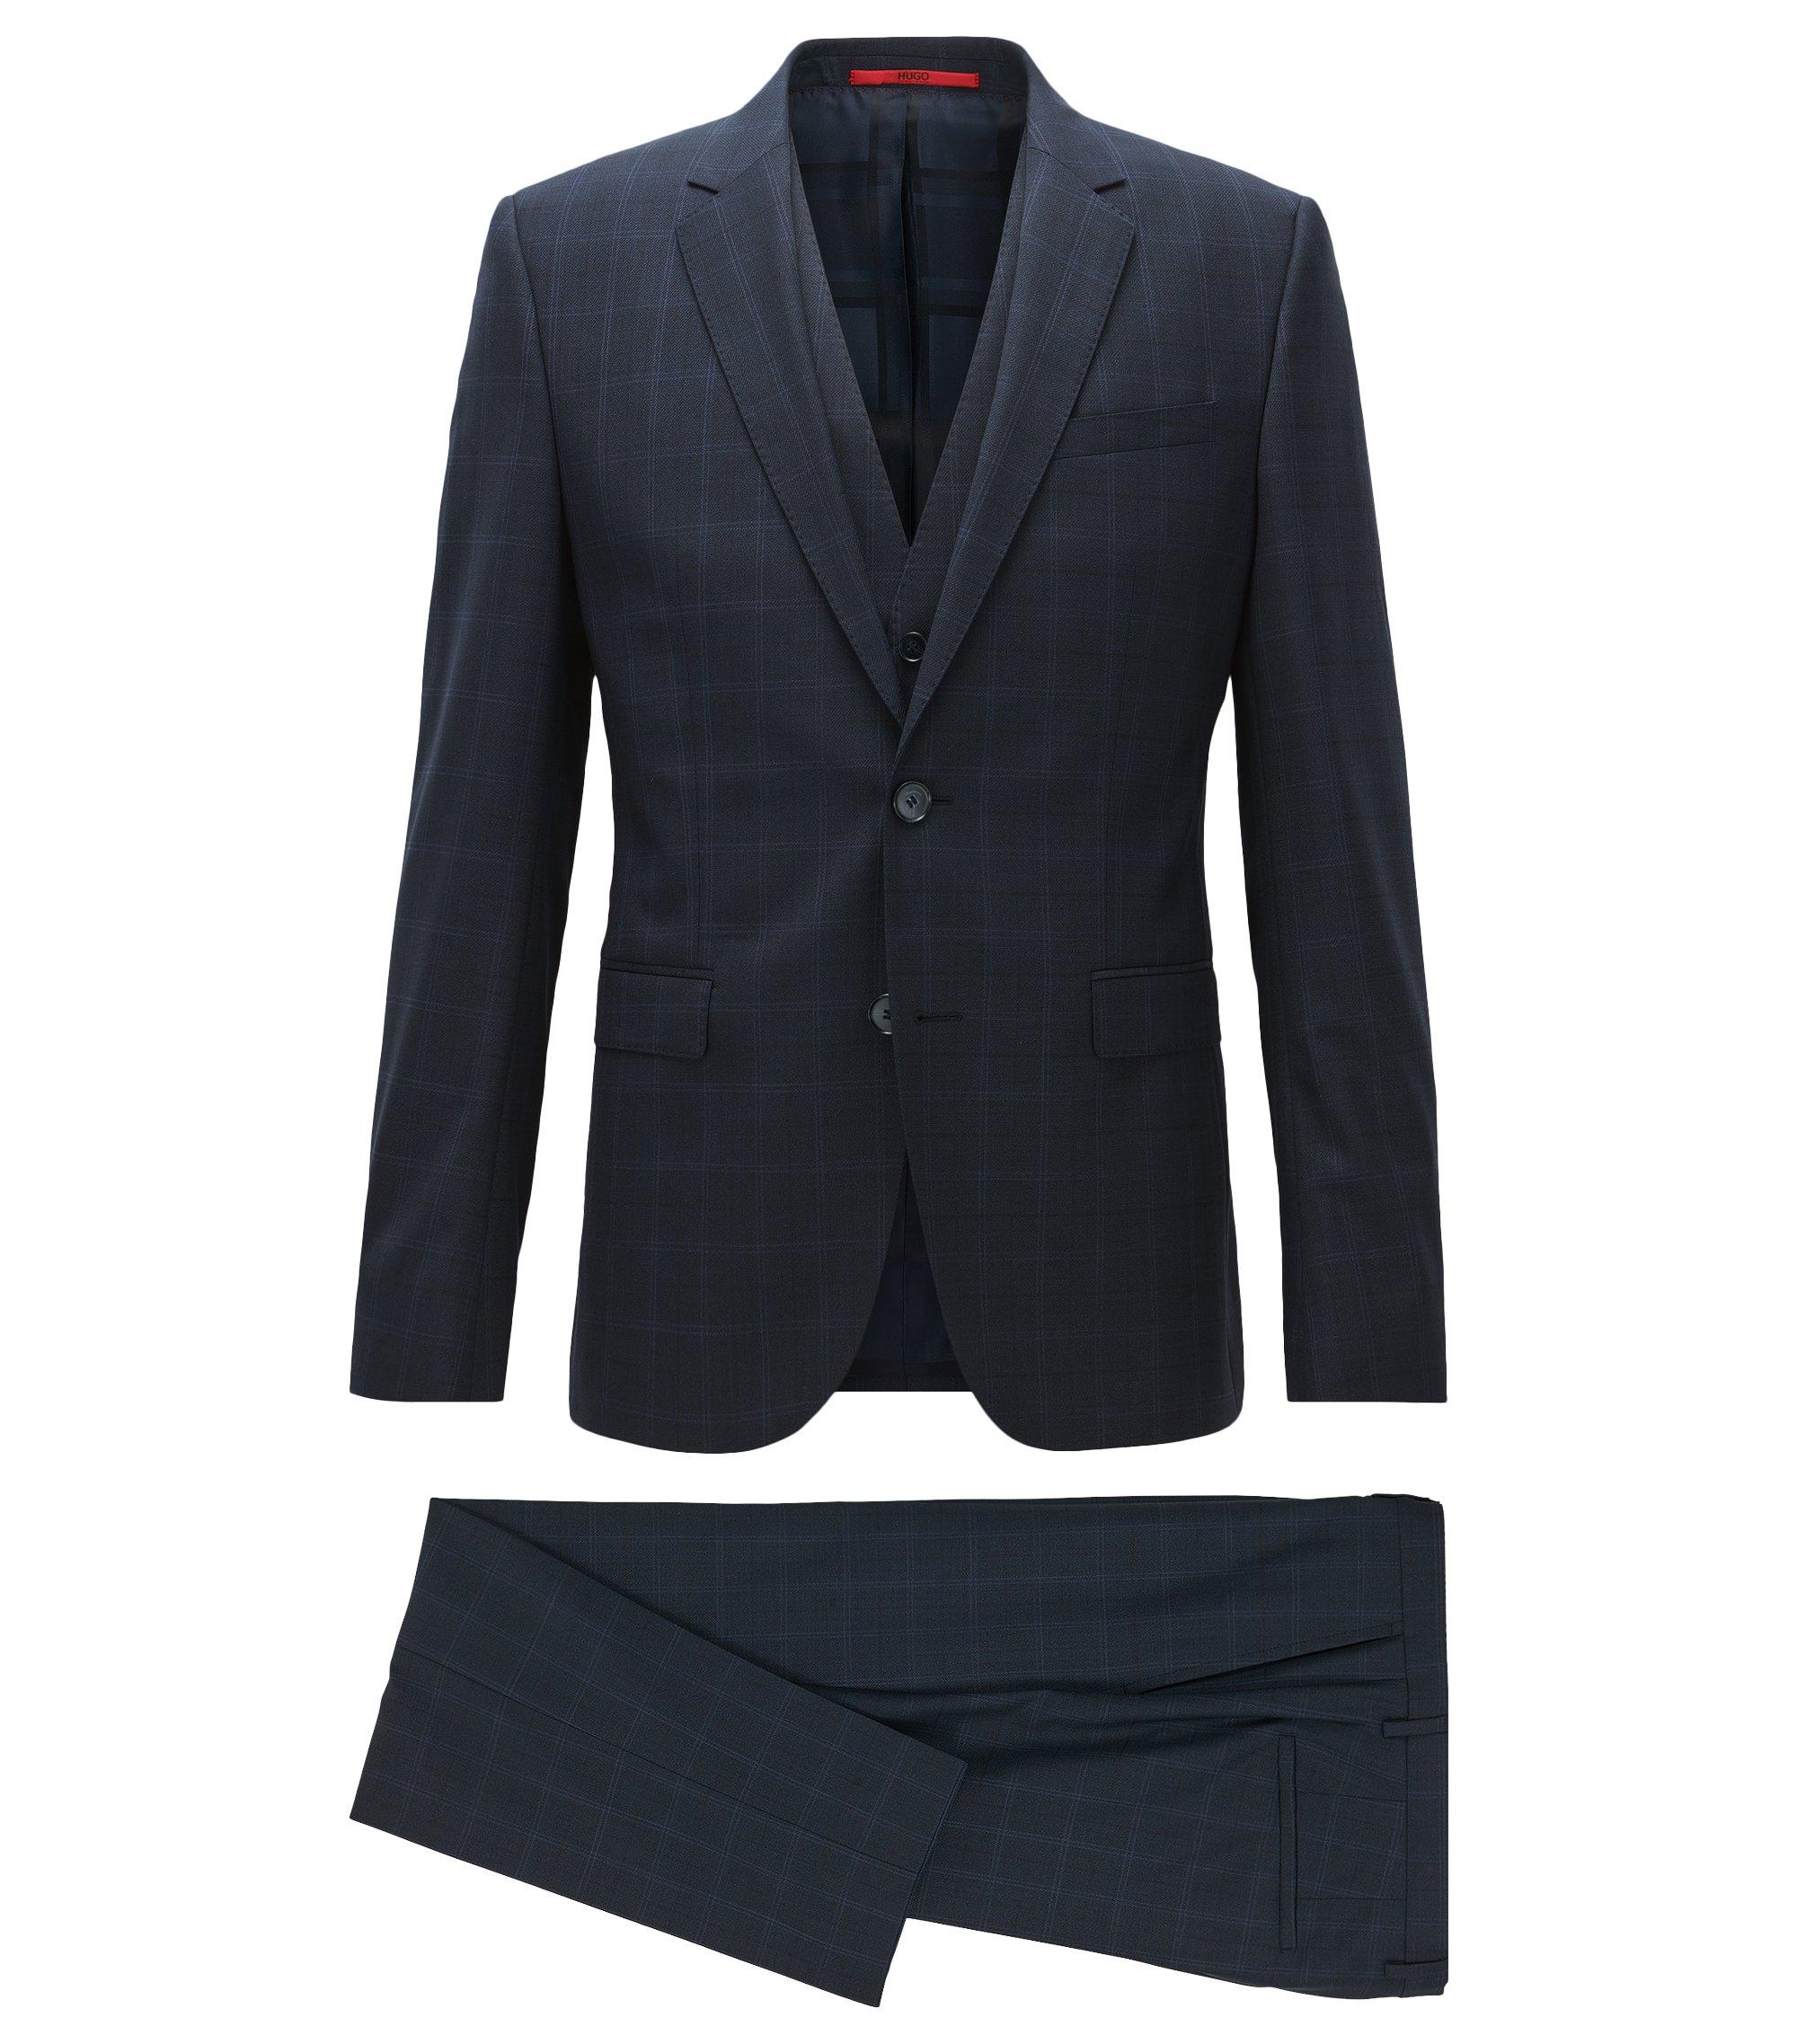 Italian Virgin Wool 3-Piece Suit, Slim Fit | Adwart/Wilard/Hets, Dark Blue